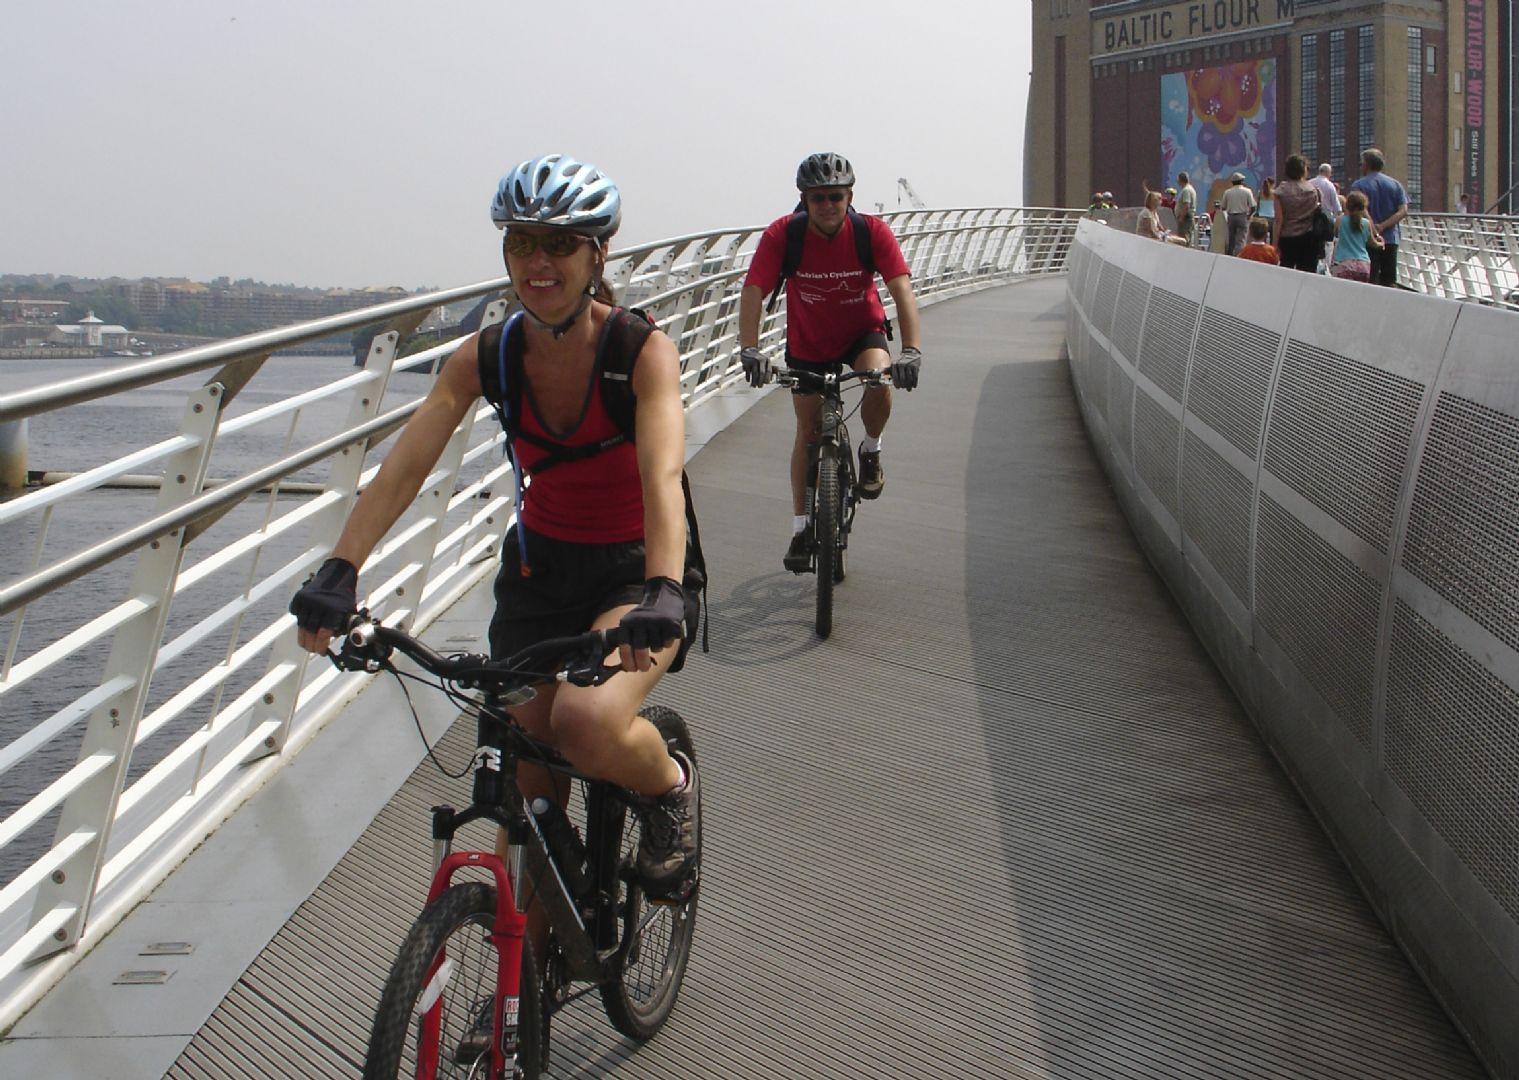 ABL0913.jpg - UK - C2C - Coast to Coast 4 Days Cycling - Self-Guided Leisure Cycling Holiday - Leisure Cycling